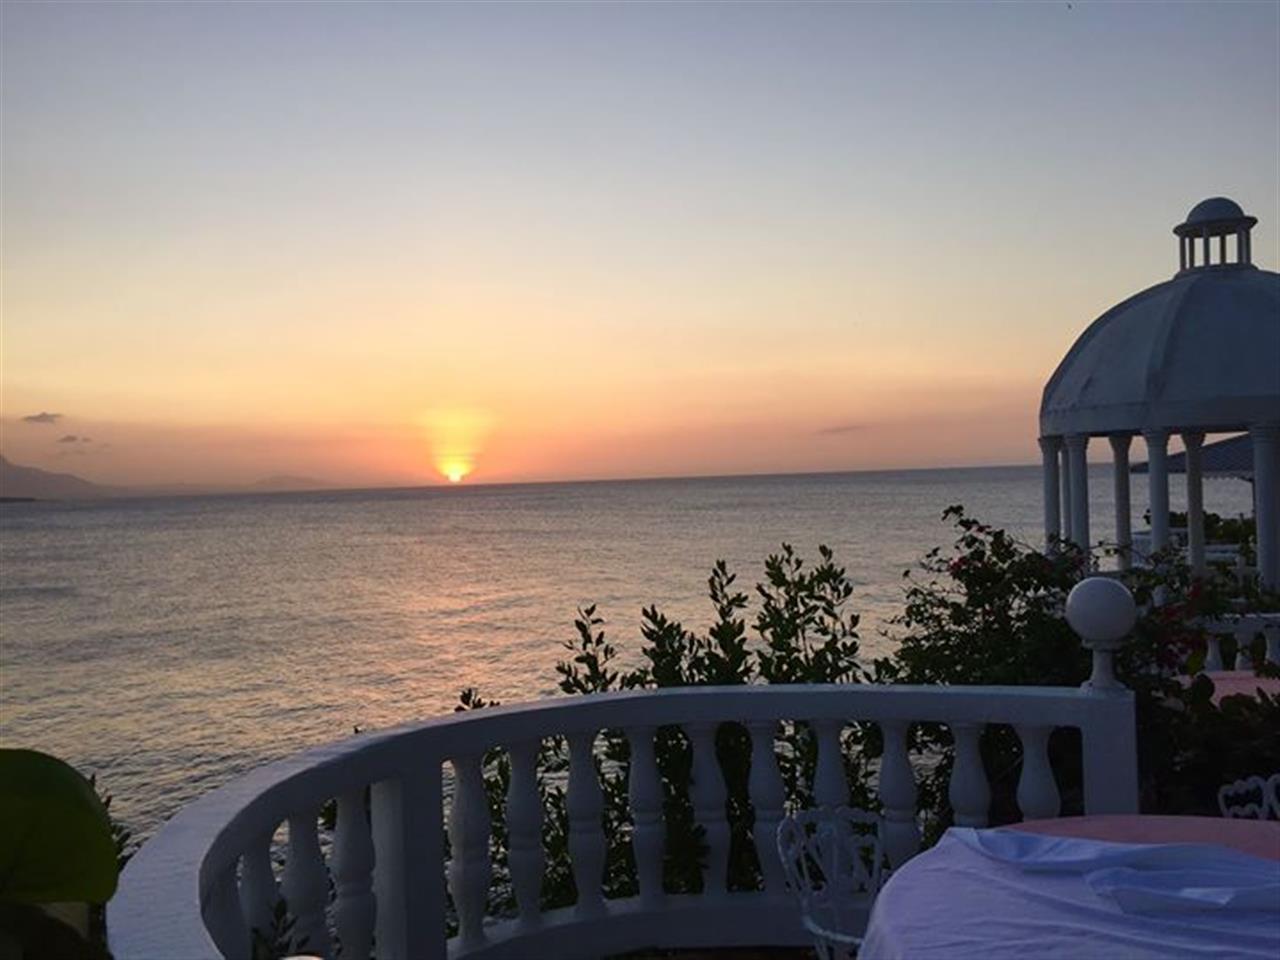 Good night! Just beautiful!  La Puntilla de Pierre Giorgio, Sosua, Dominican Republic.  #Sosua #DominicanRepublic #Caribbean